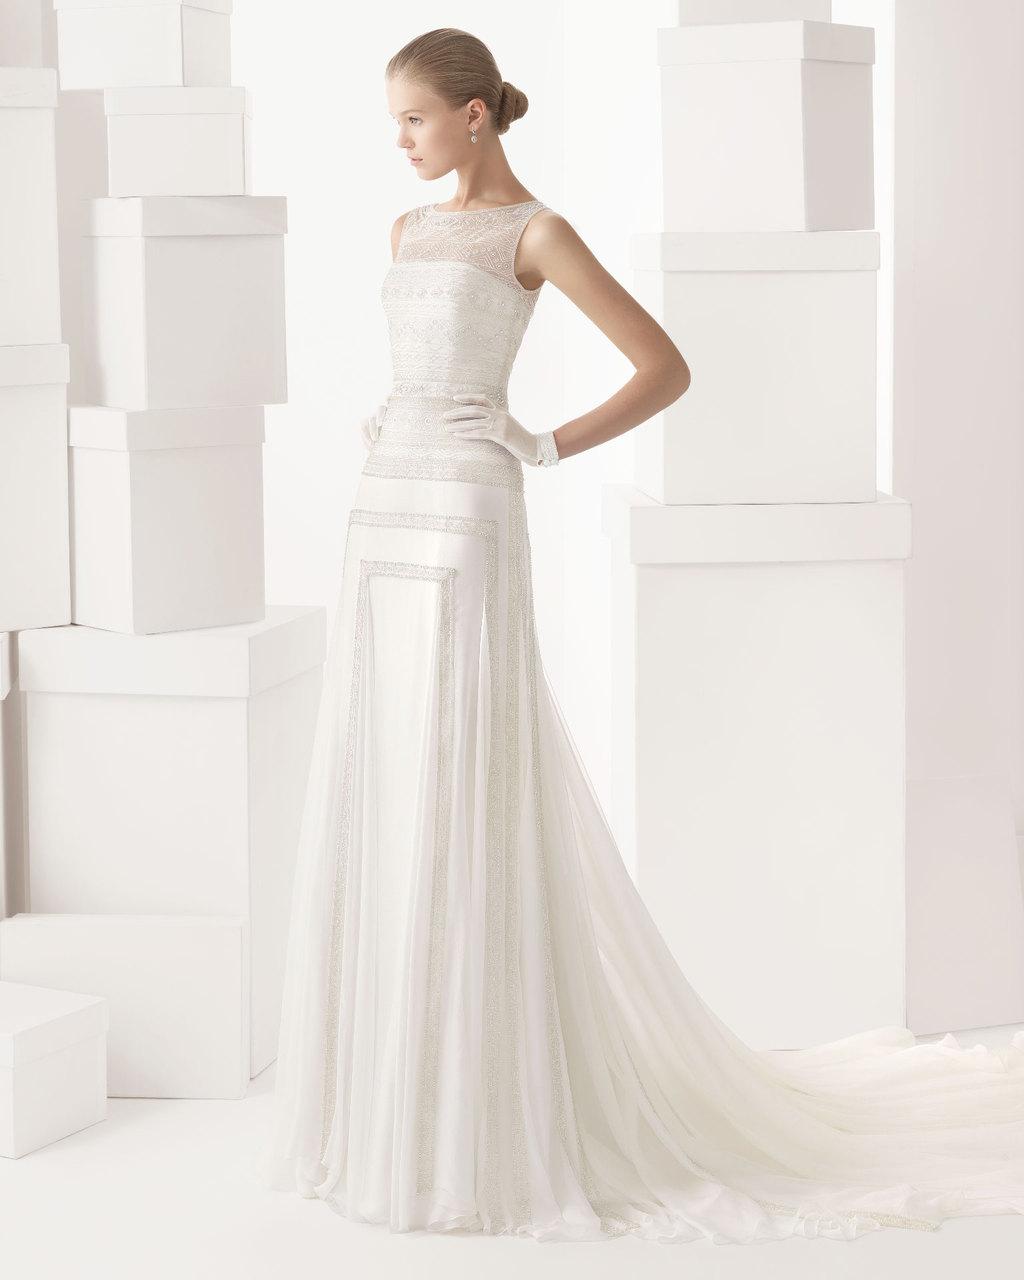 Rosa clara wedding dress 2014 bridal cintia for Rosa clara wedding dresses 2014